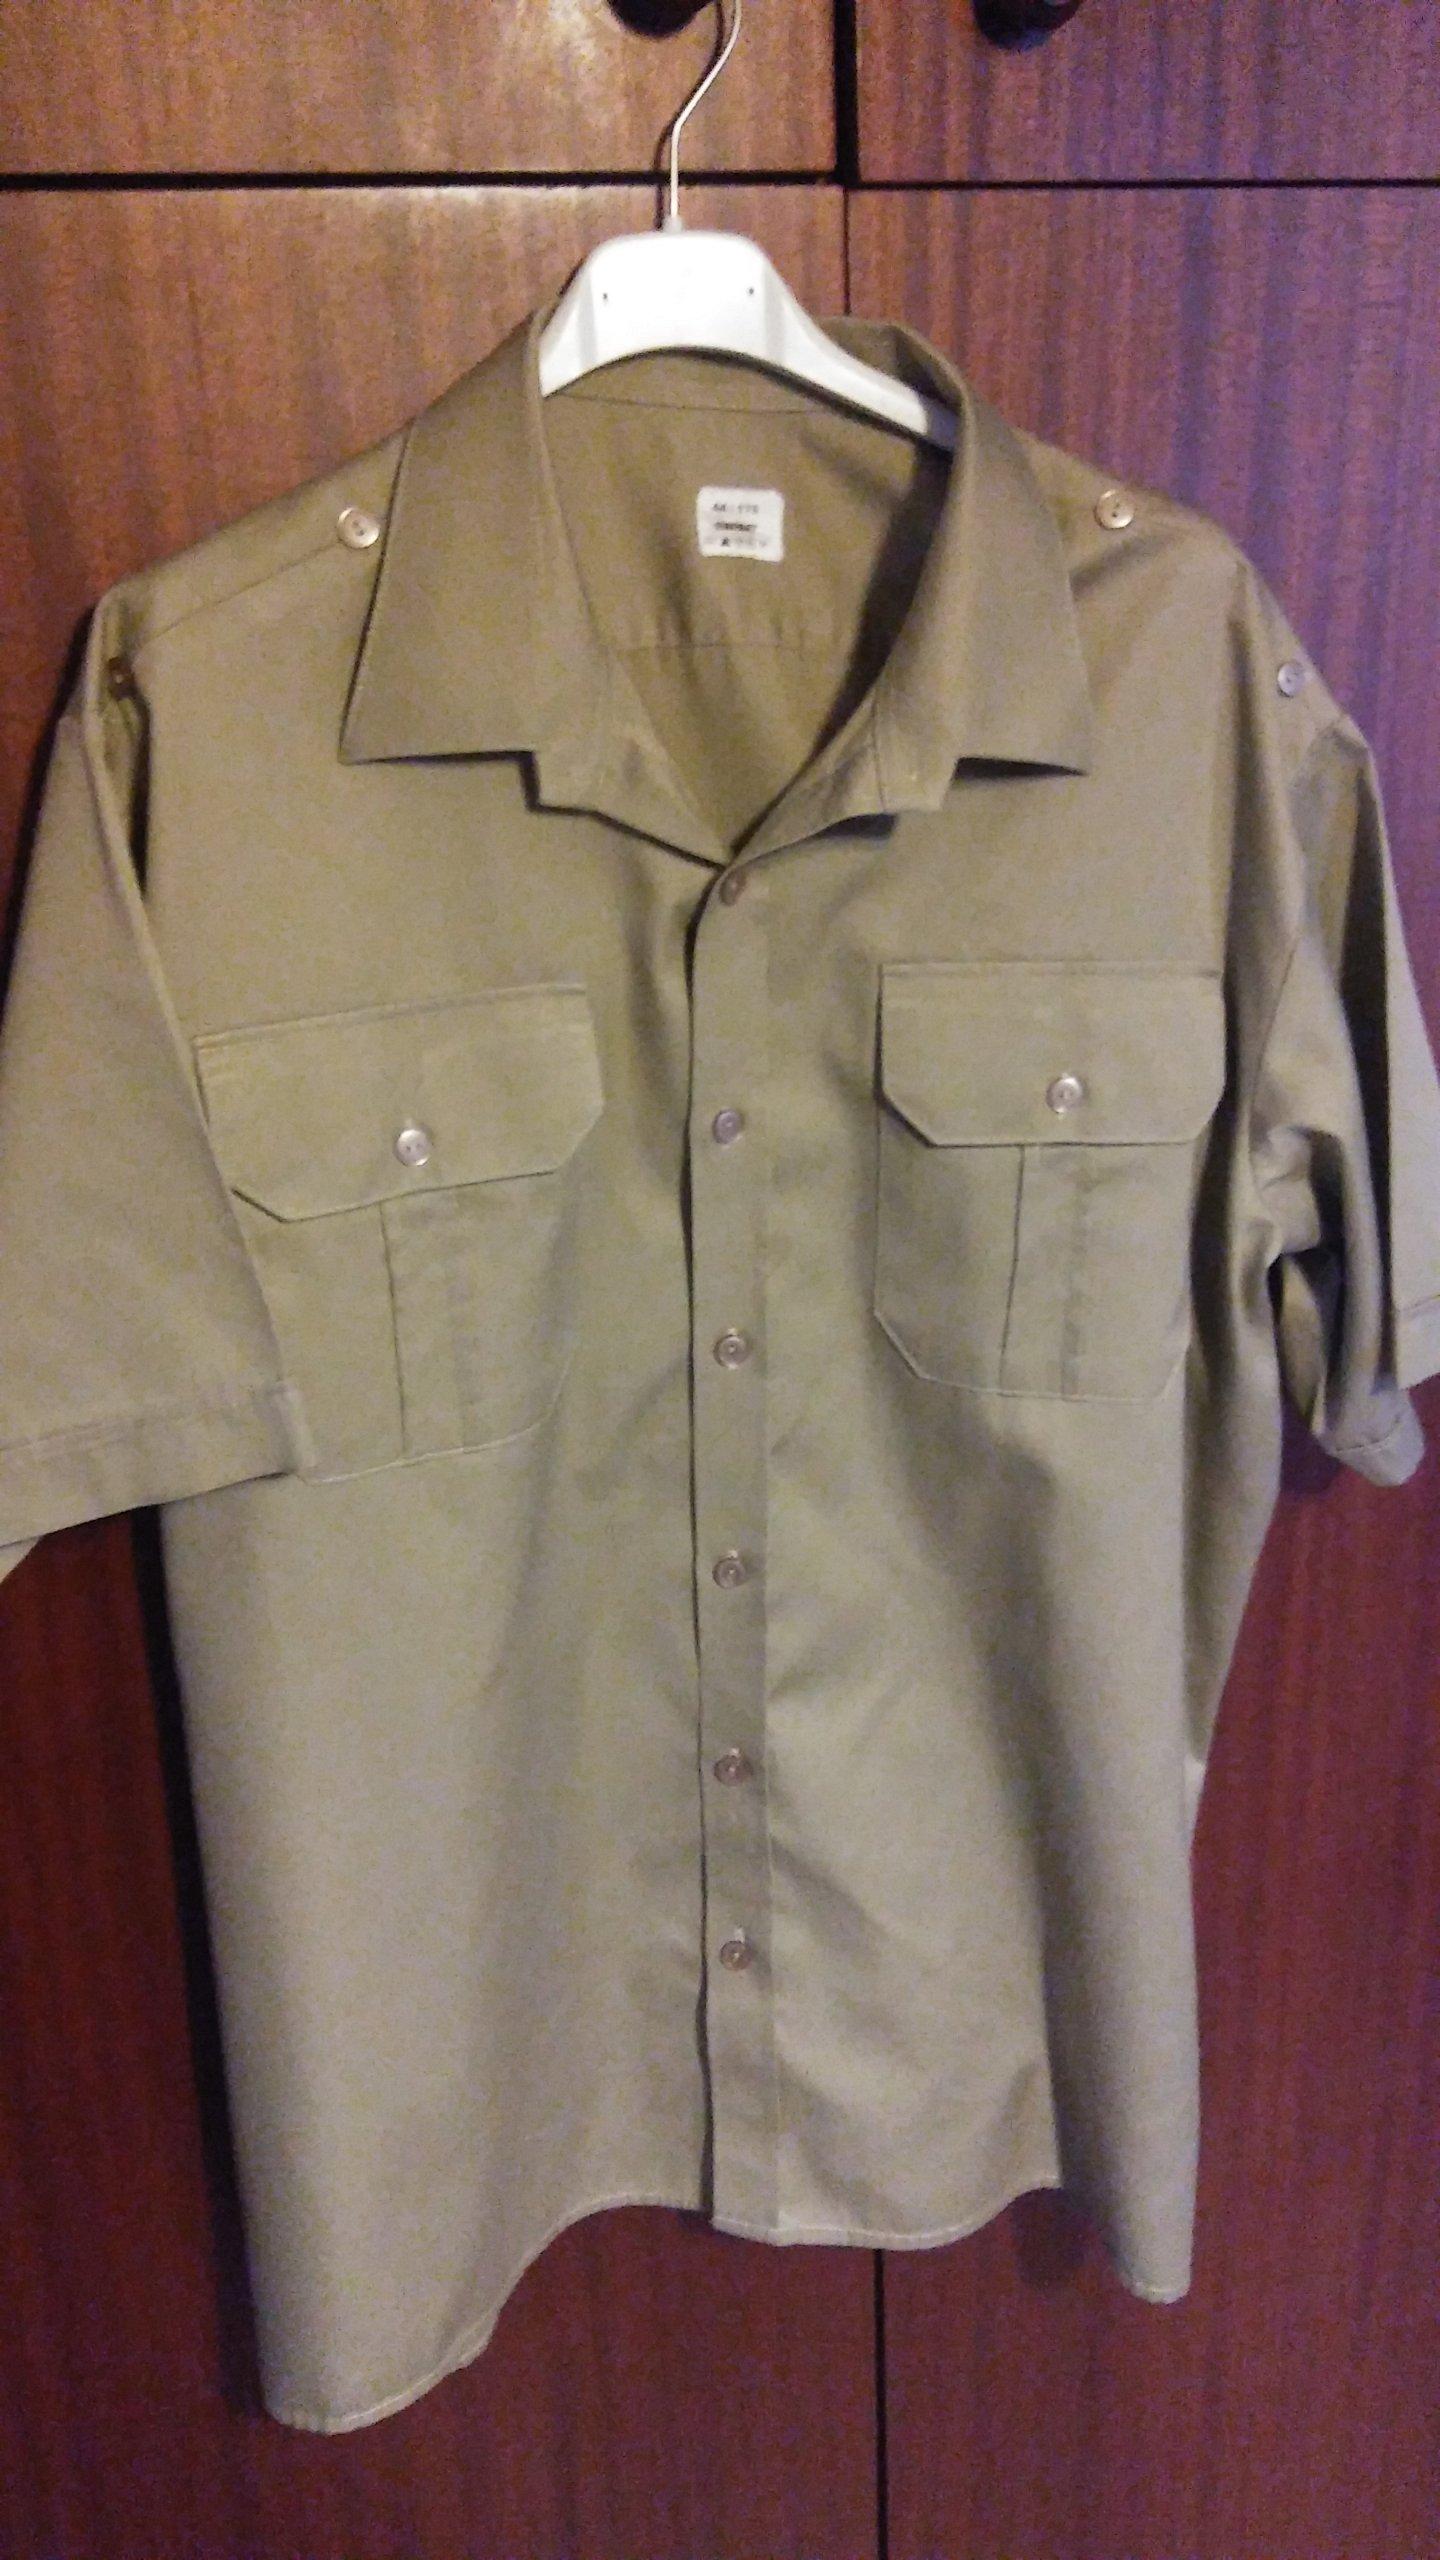 cd9a1977204dbb Koszula oficerska WP (krótki rękaw) MON 44/175 - 7707718946 ...